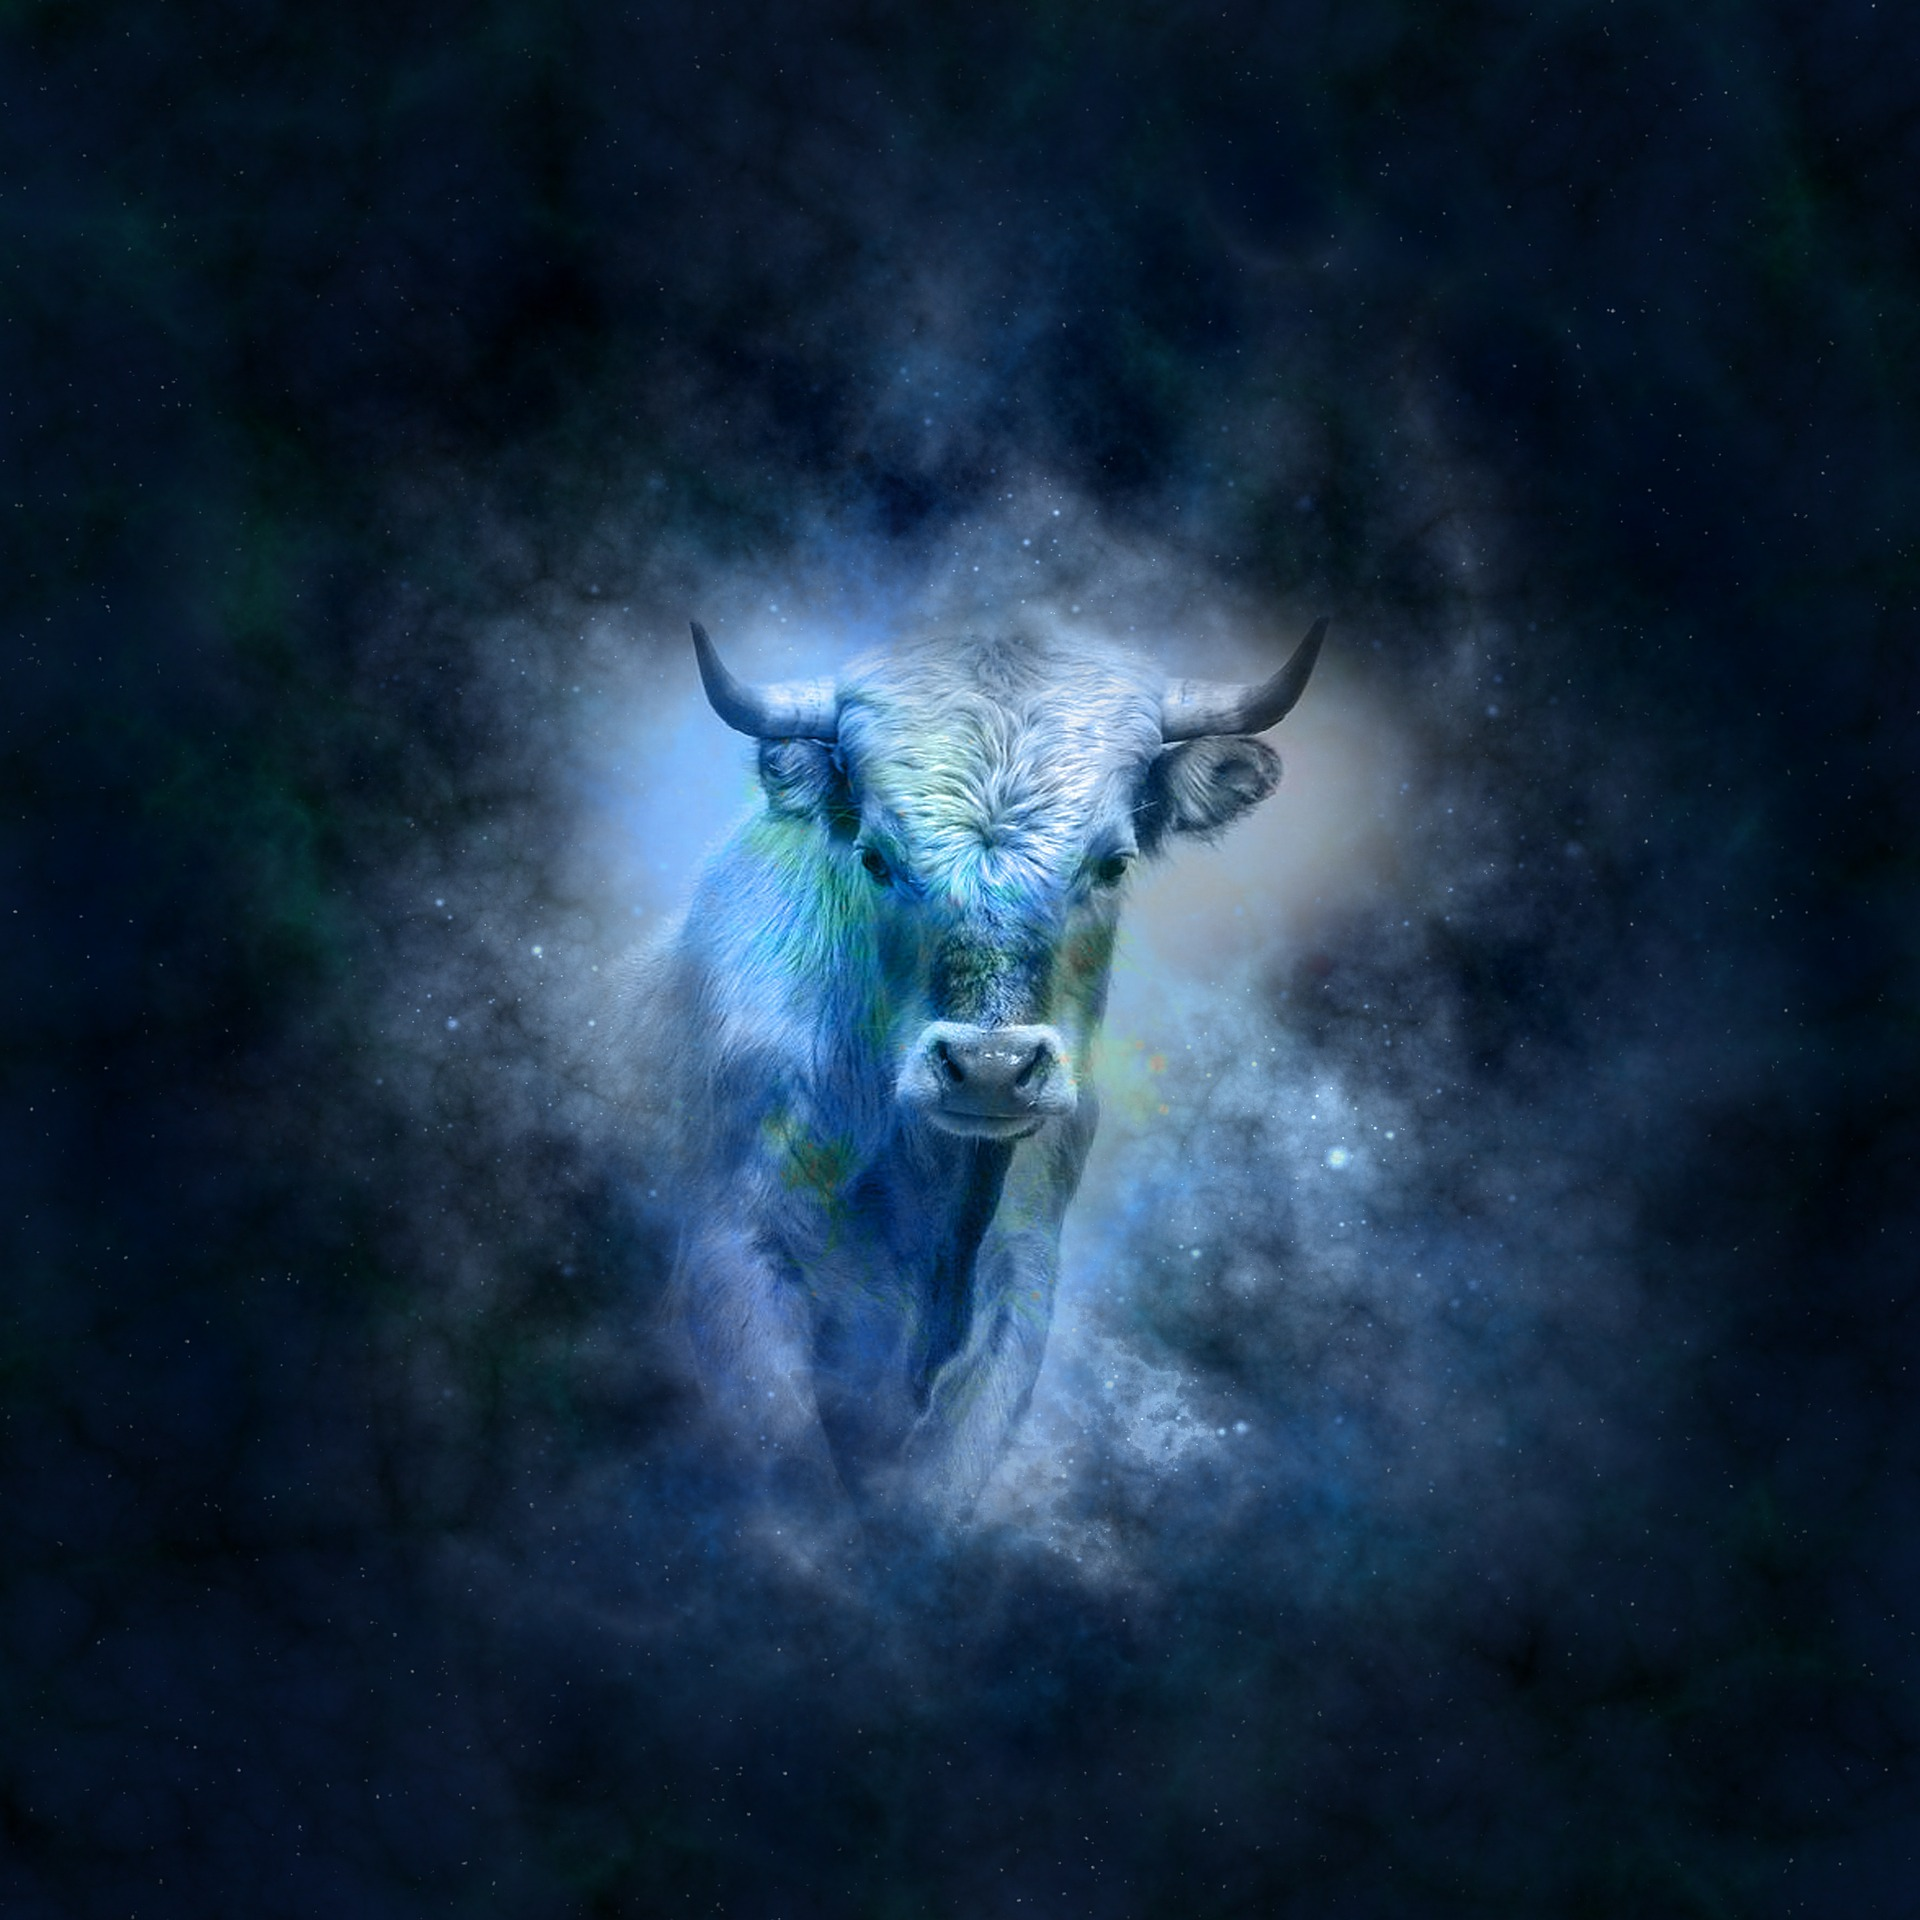 Horoscop săptămânal Minerva 7-13 septembrie 2020 - Taur